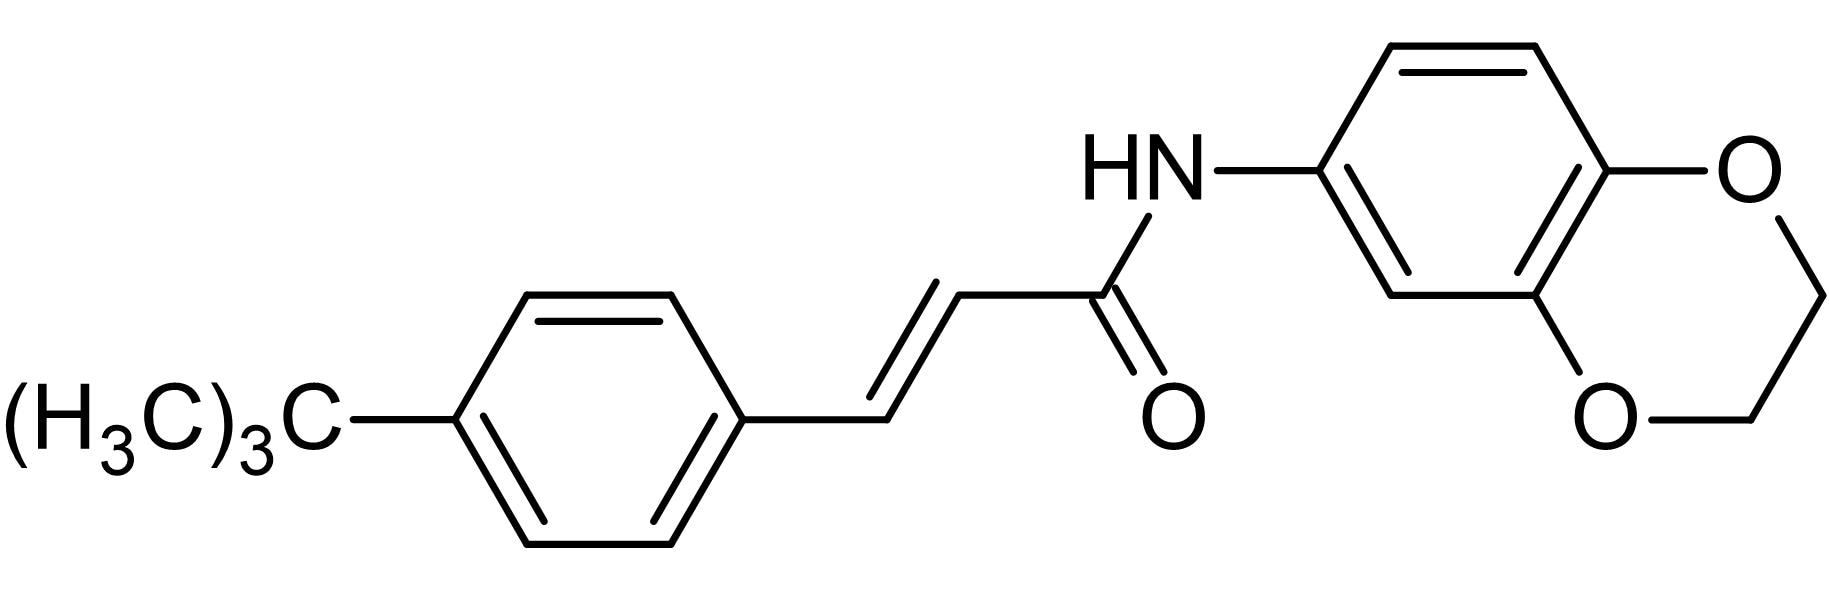 Chemical Structure - AMG 9810, TRPV1 receptor antagonist (ab145874)